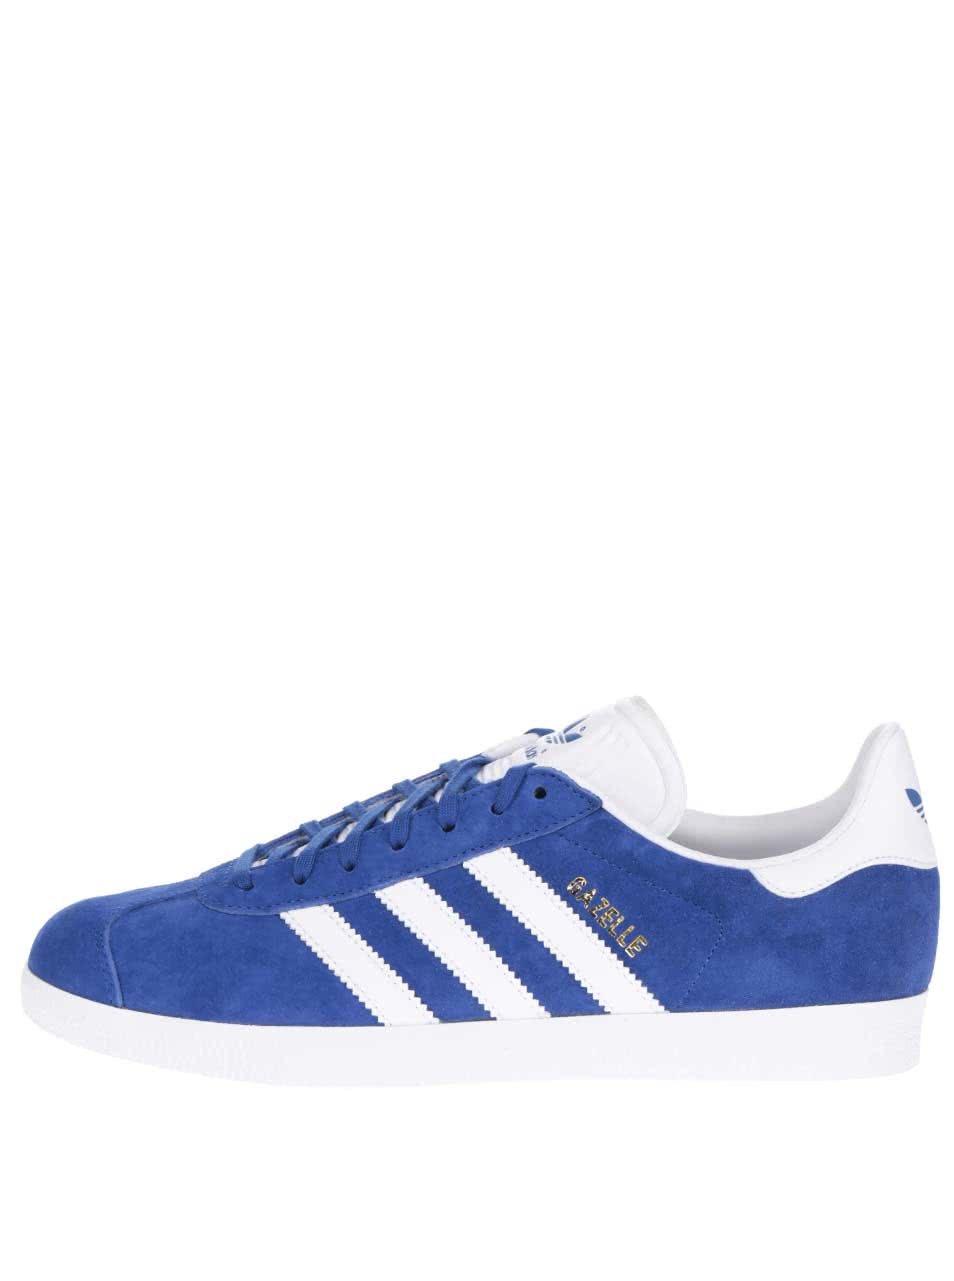 6227dfb63d91 Modré pánske semišové tenisky adidas Originals Gazelle ...